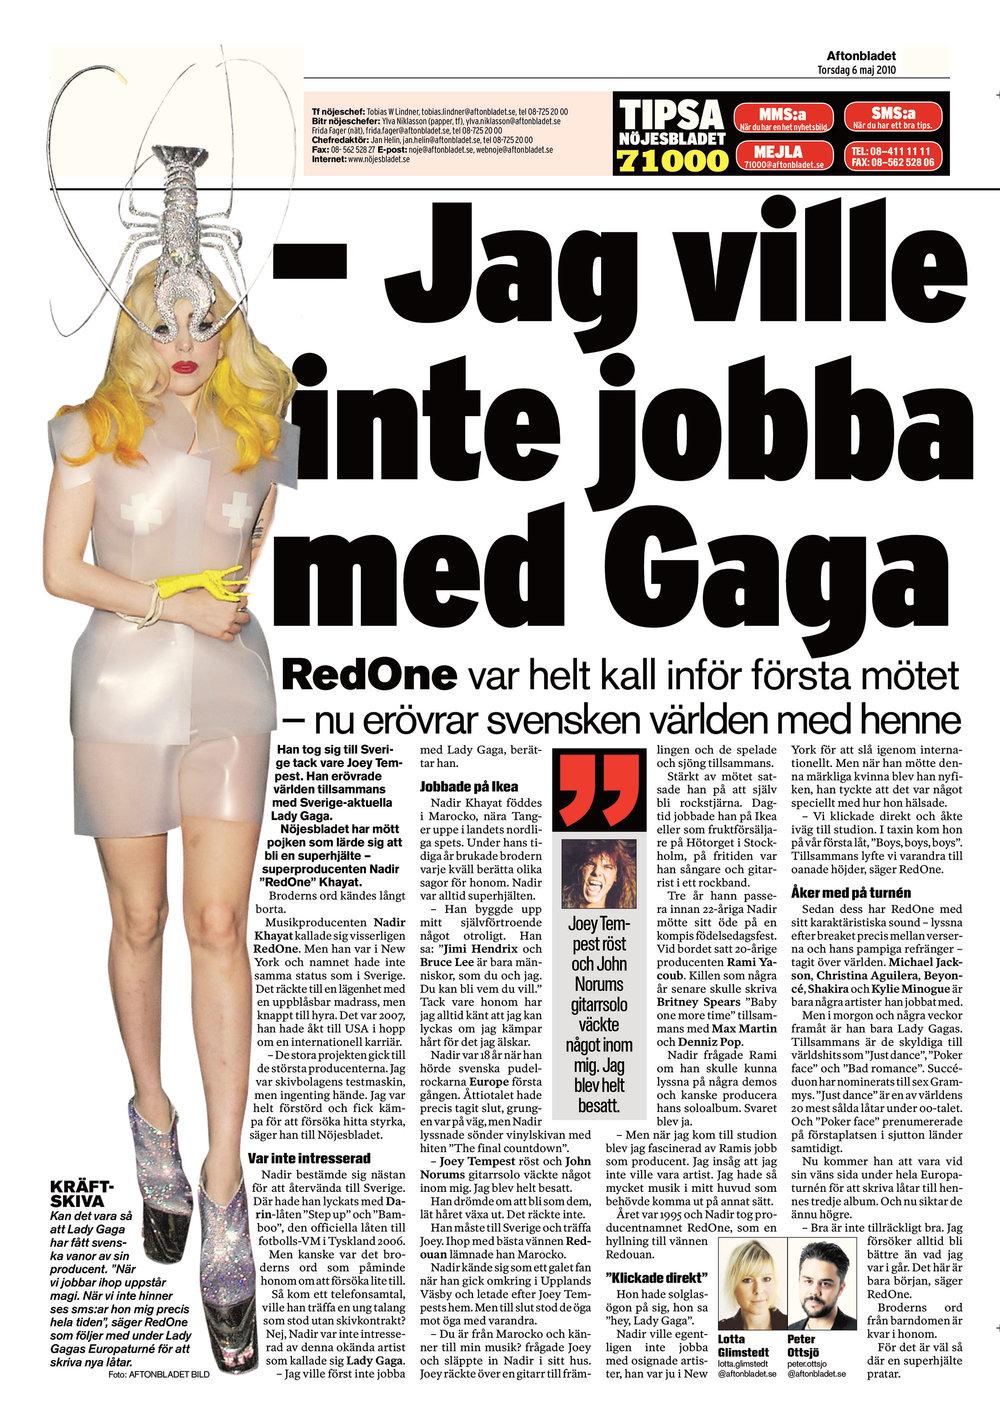 RedOne-Aftonbladet.jpg